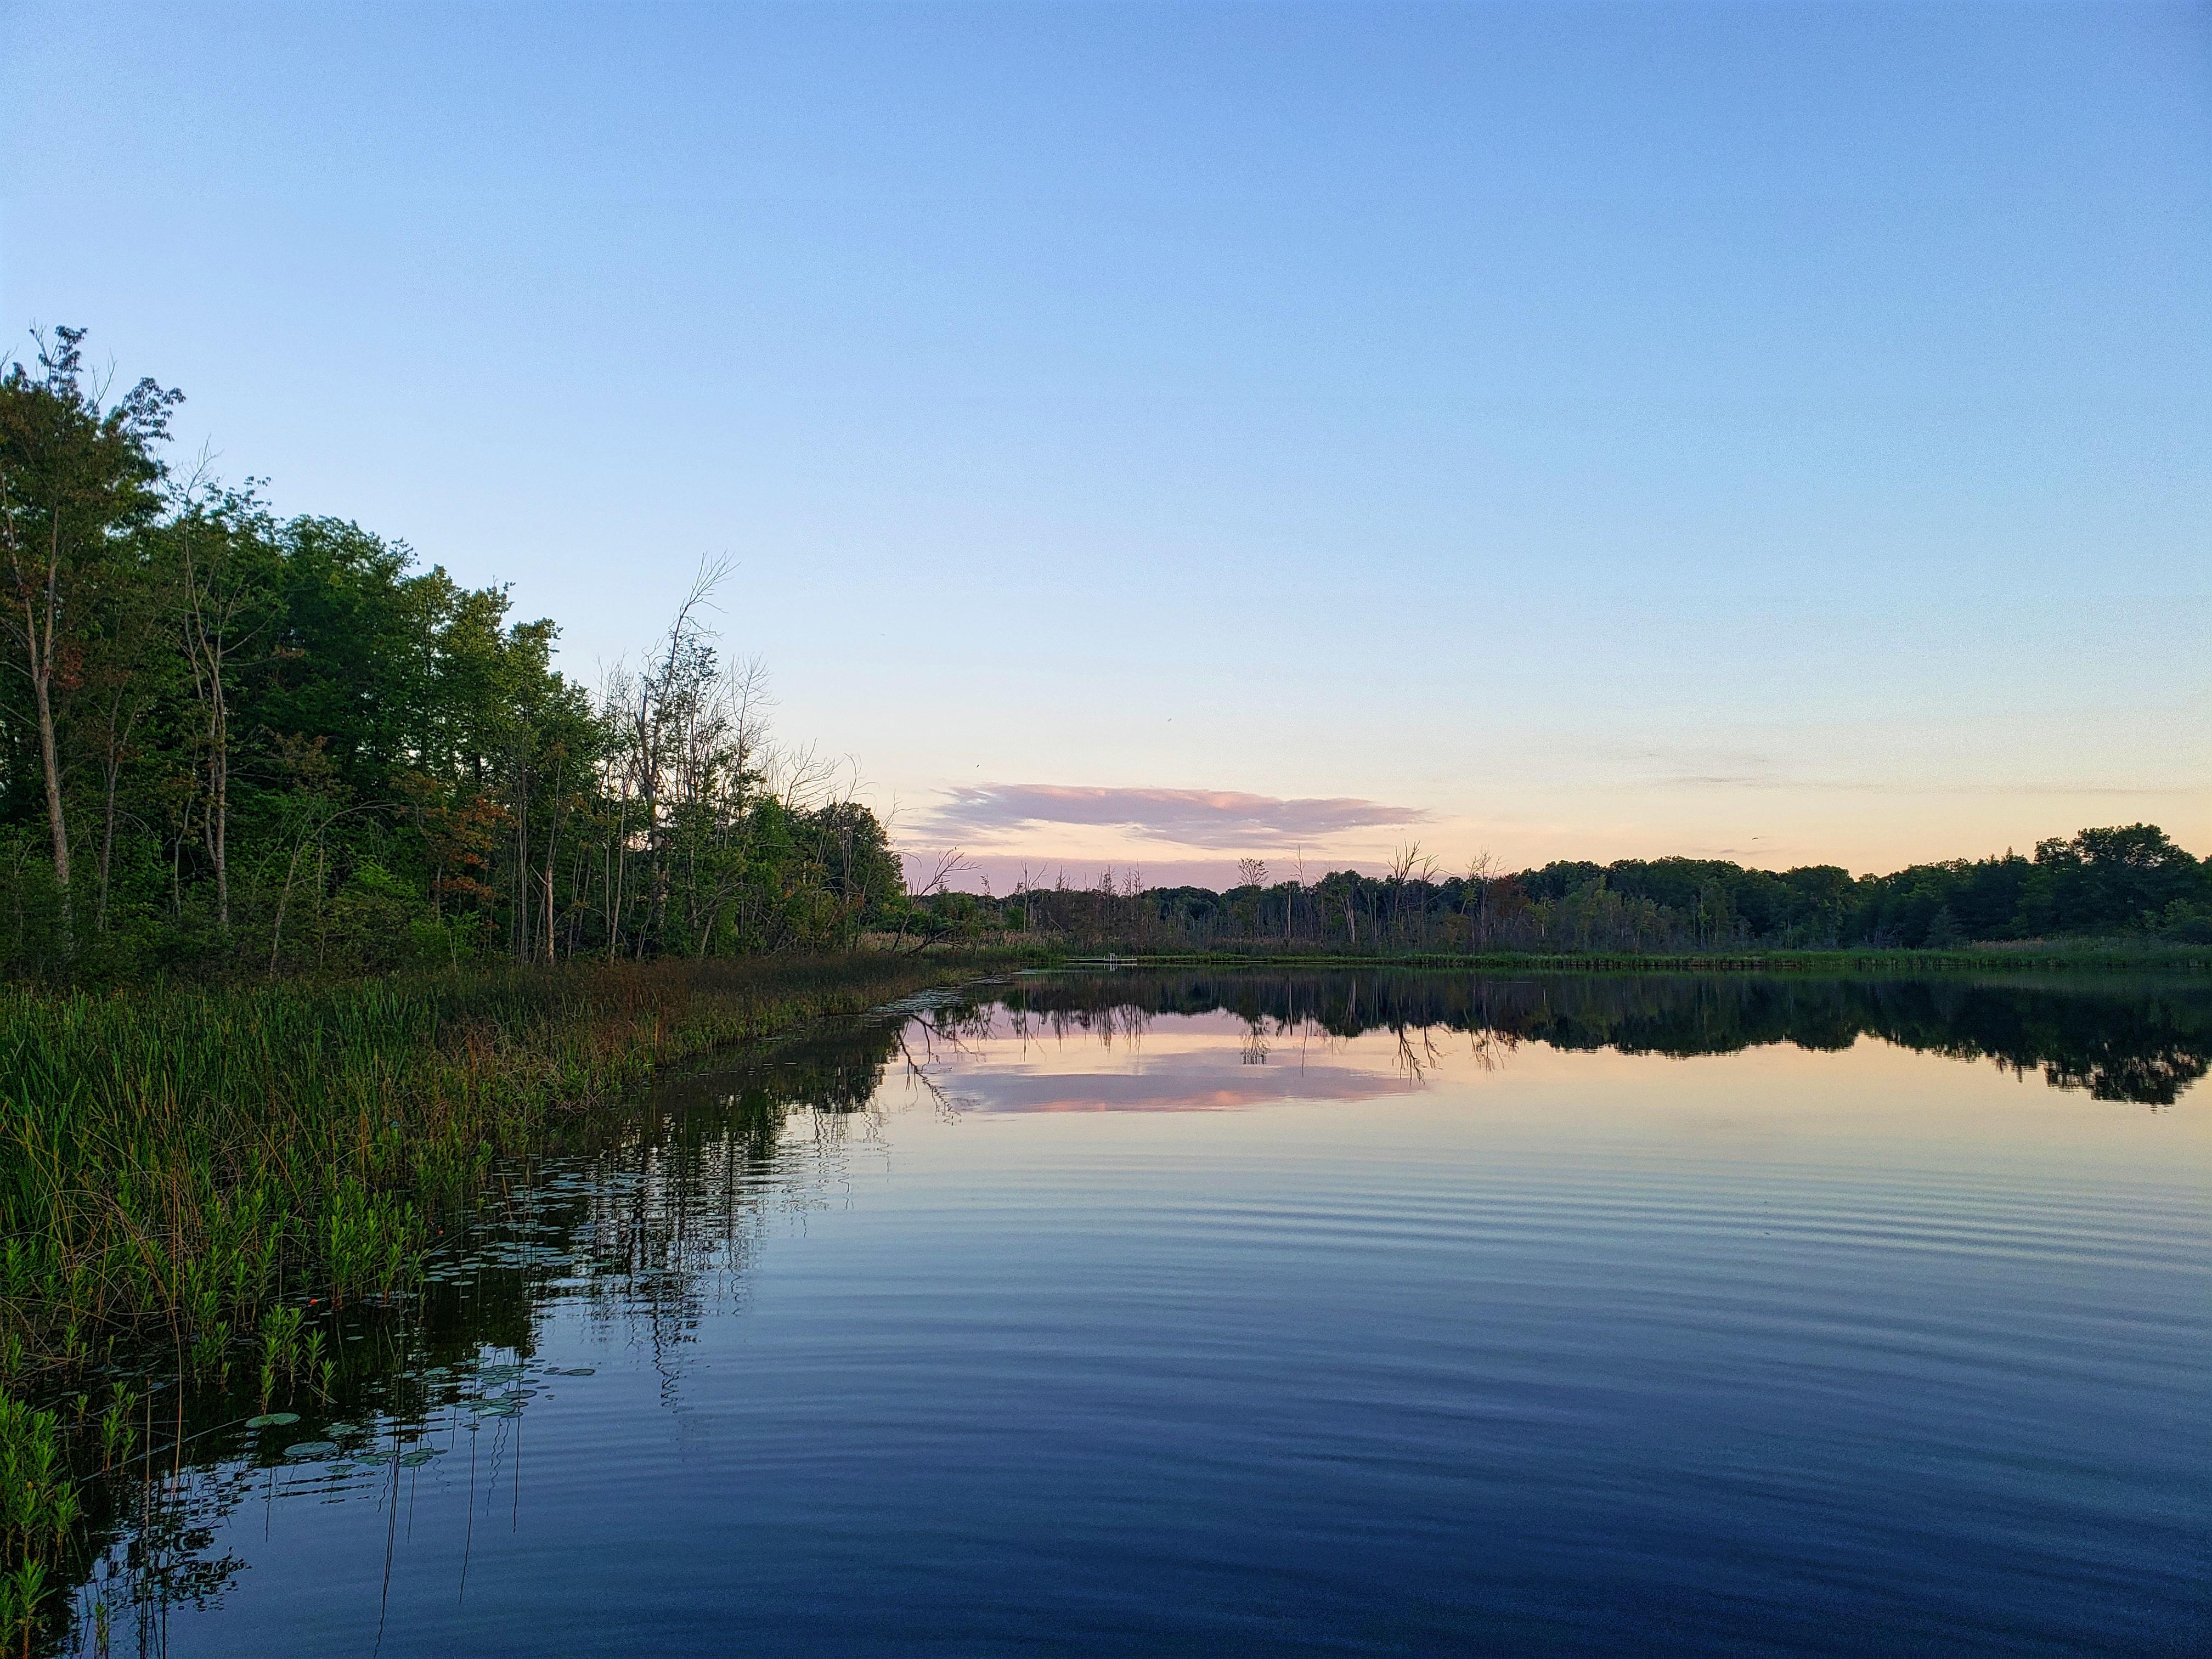 Draper Twin Lake at sunrise.